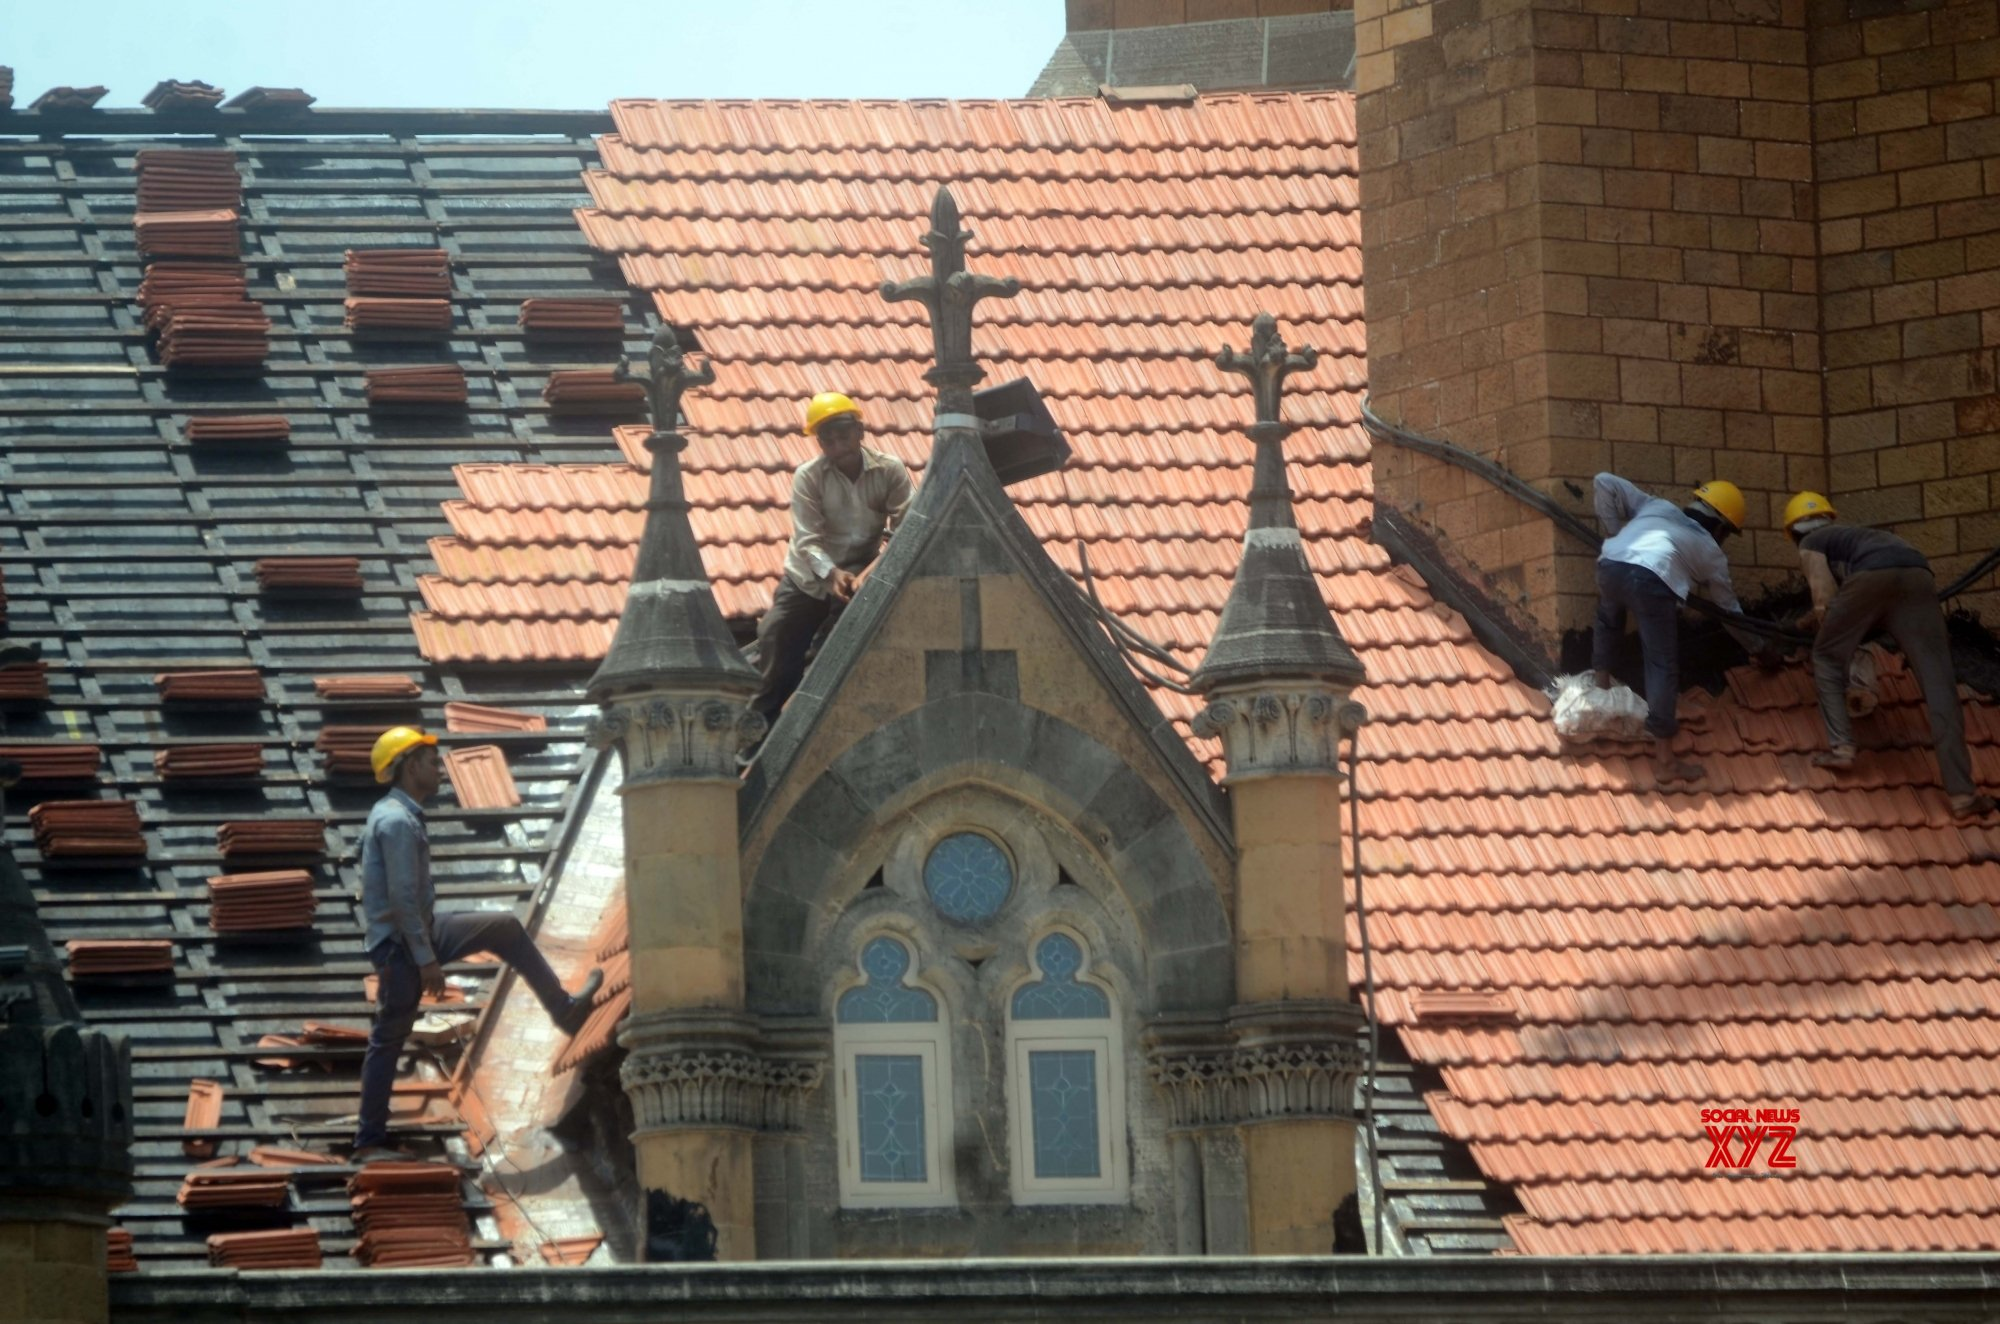 Mumbai: Repair works underway at Chhatrapati Shivaji Maharaj Terminus #Gallery